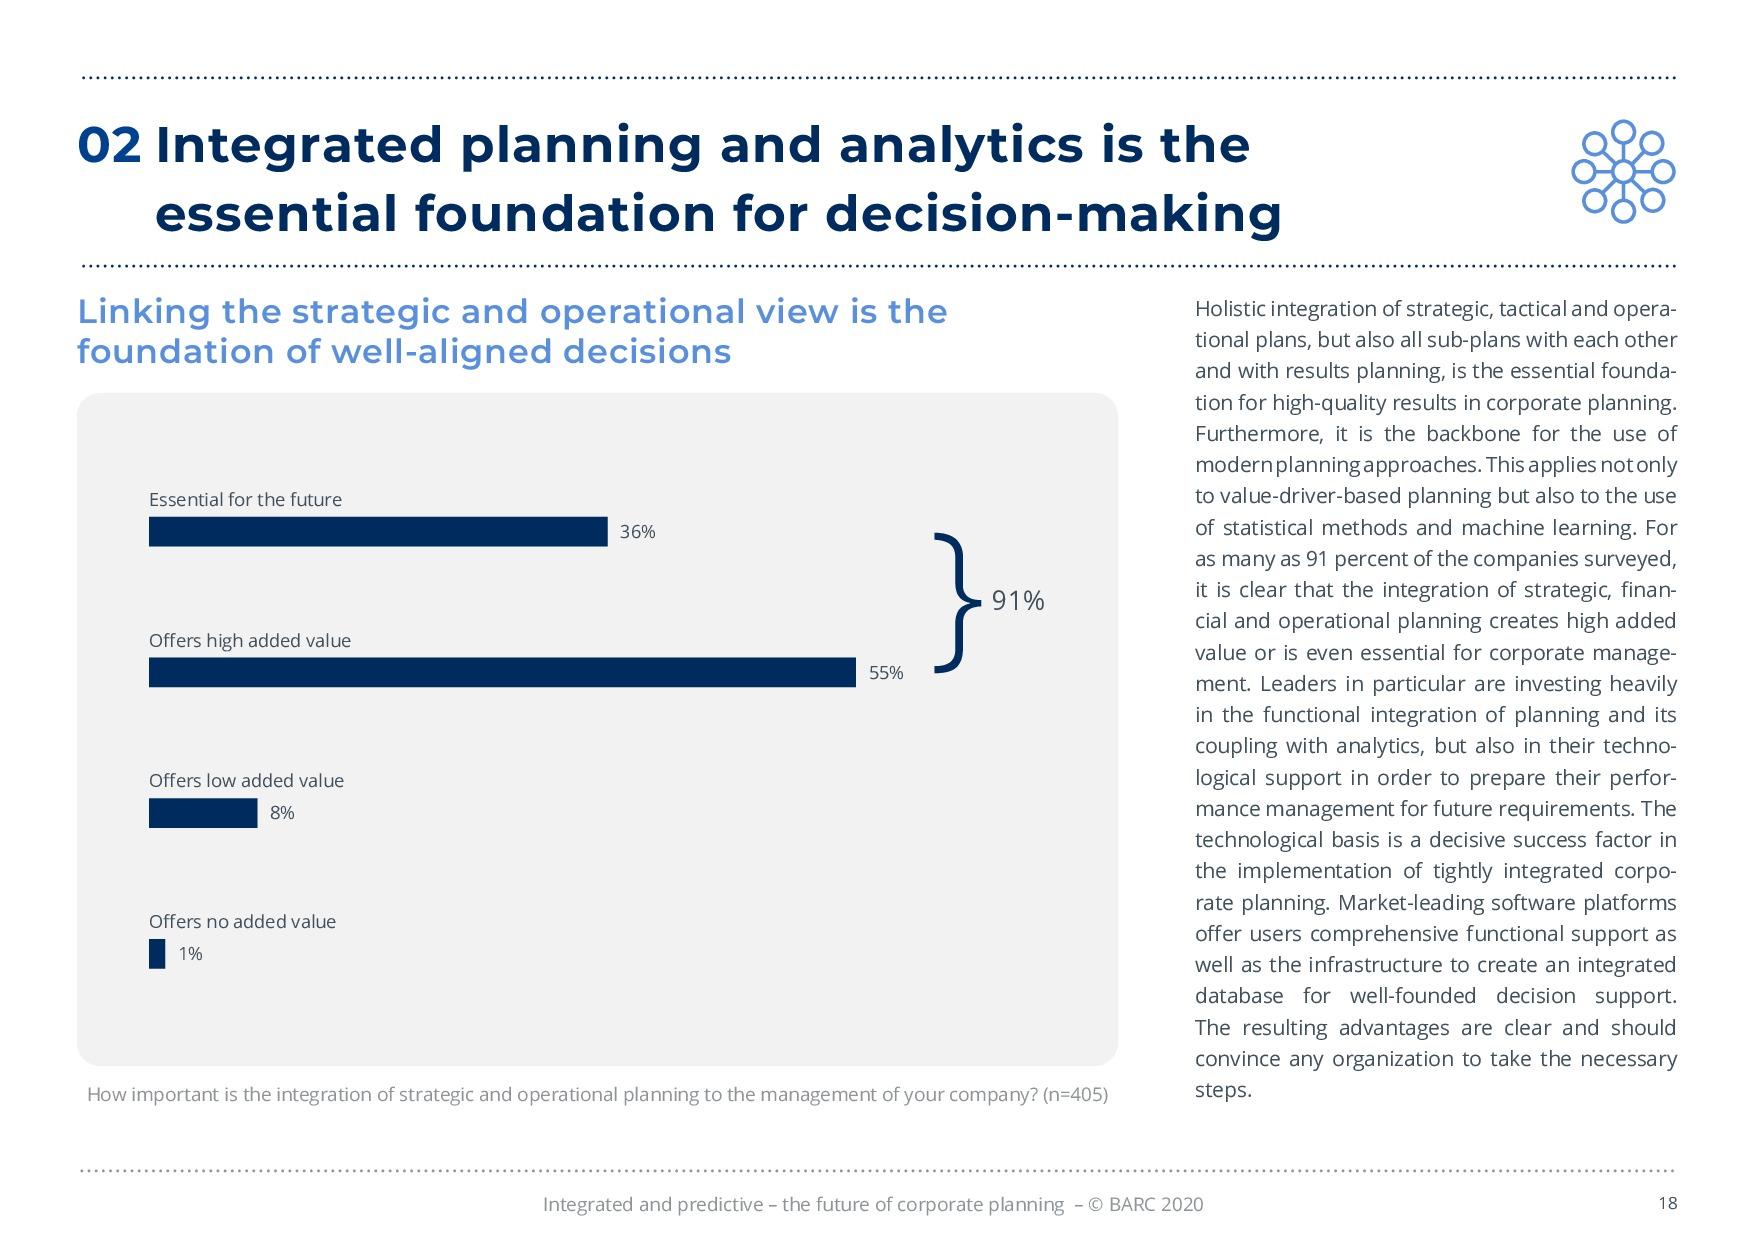 BARC – 統合と予測 – 経営計画の未来 | Page 18